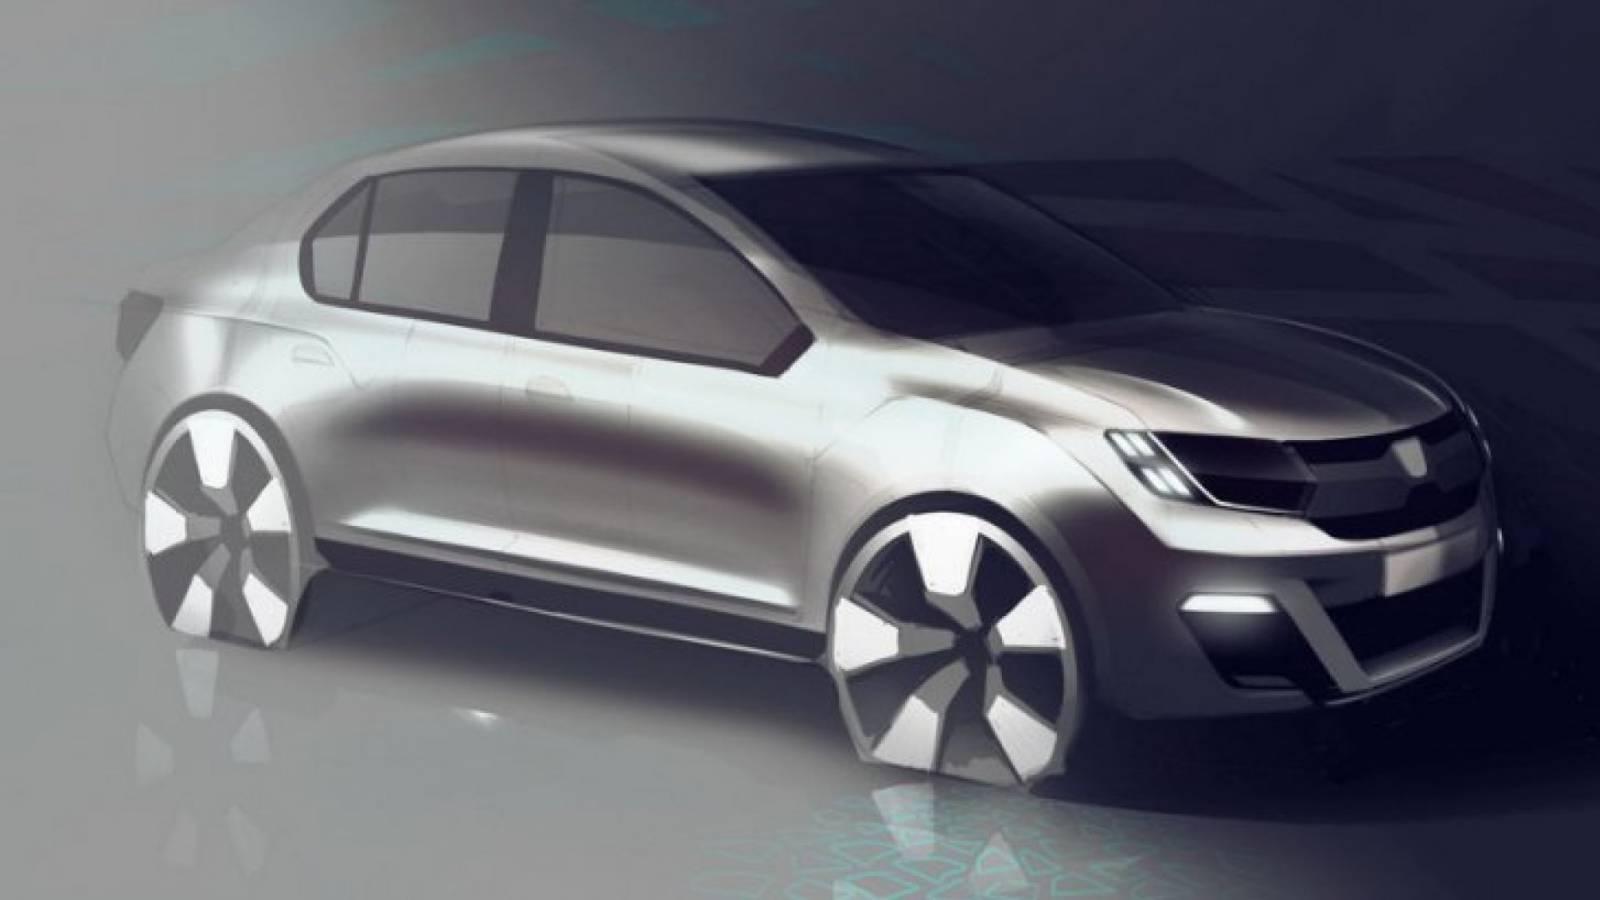 Dacia electrica dezamagire